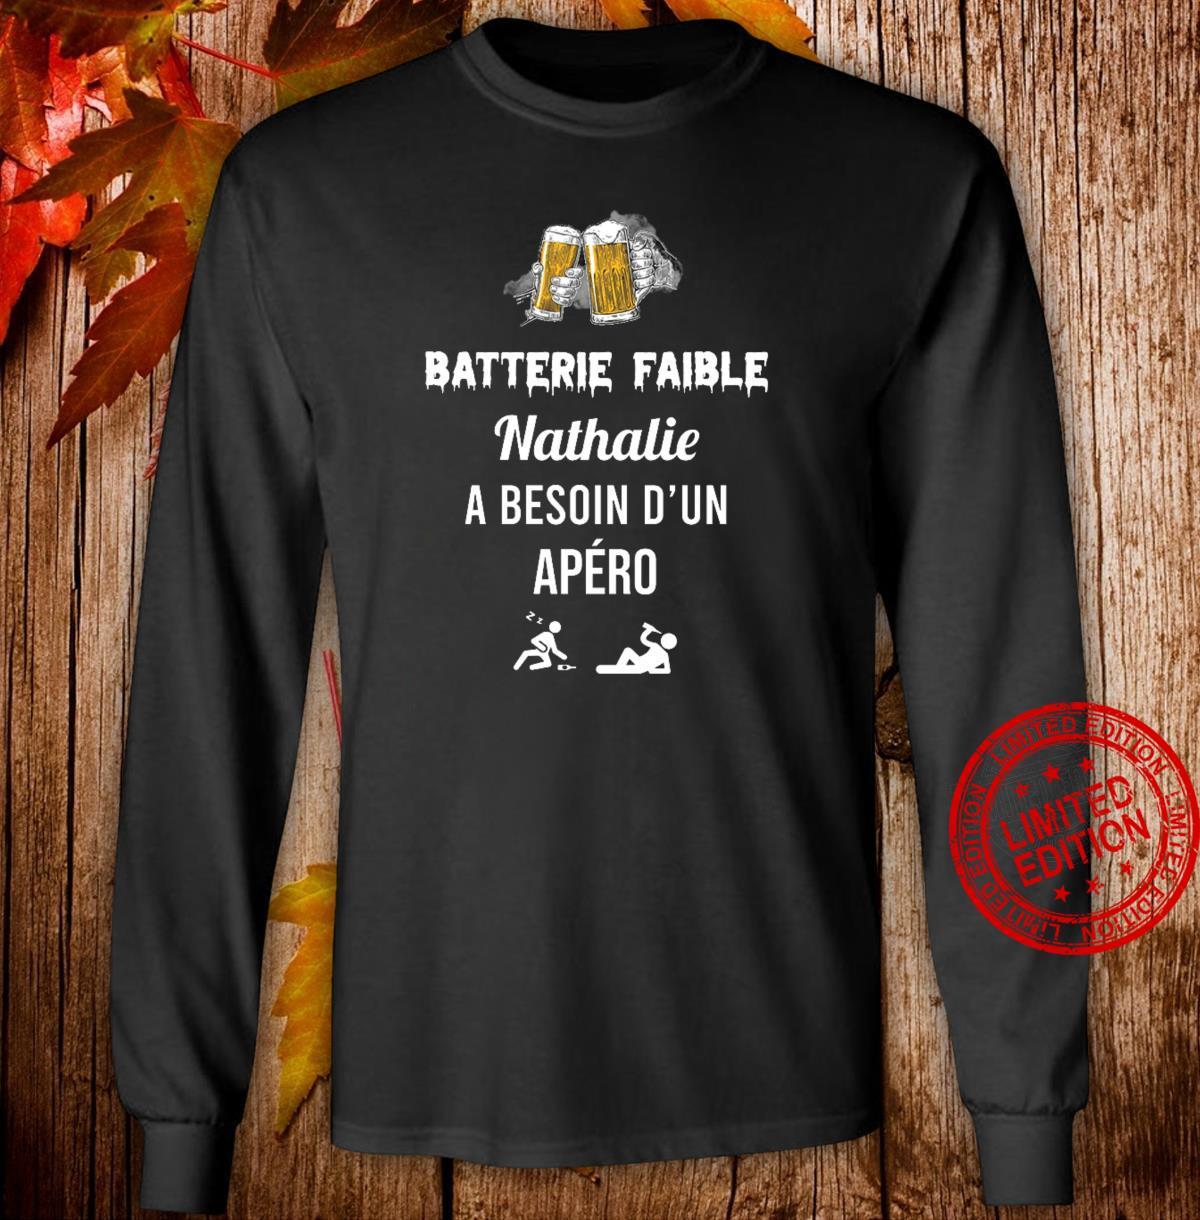 Batterie Faible Nathalie A Besoin D'un Apero Shirt long sleeved